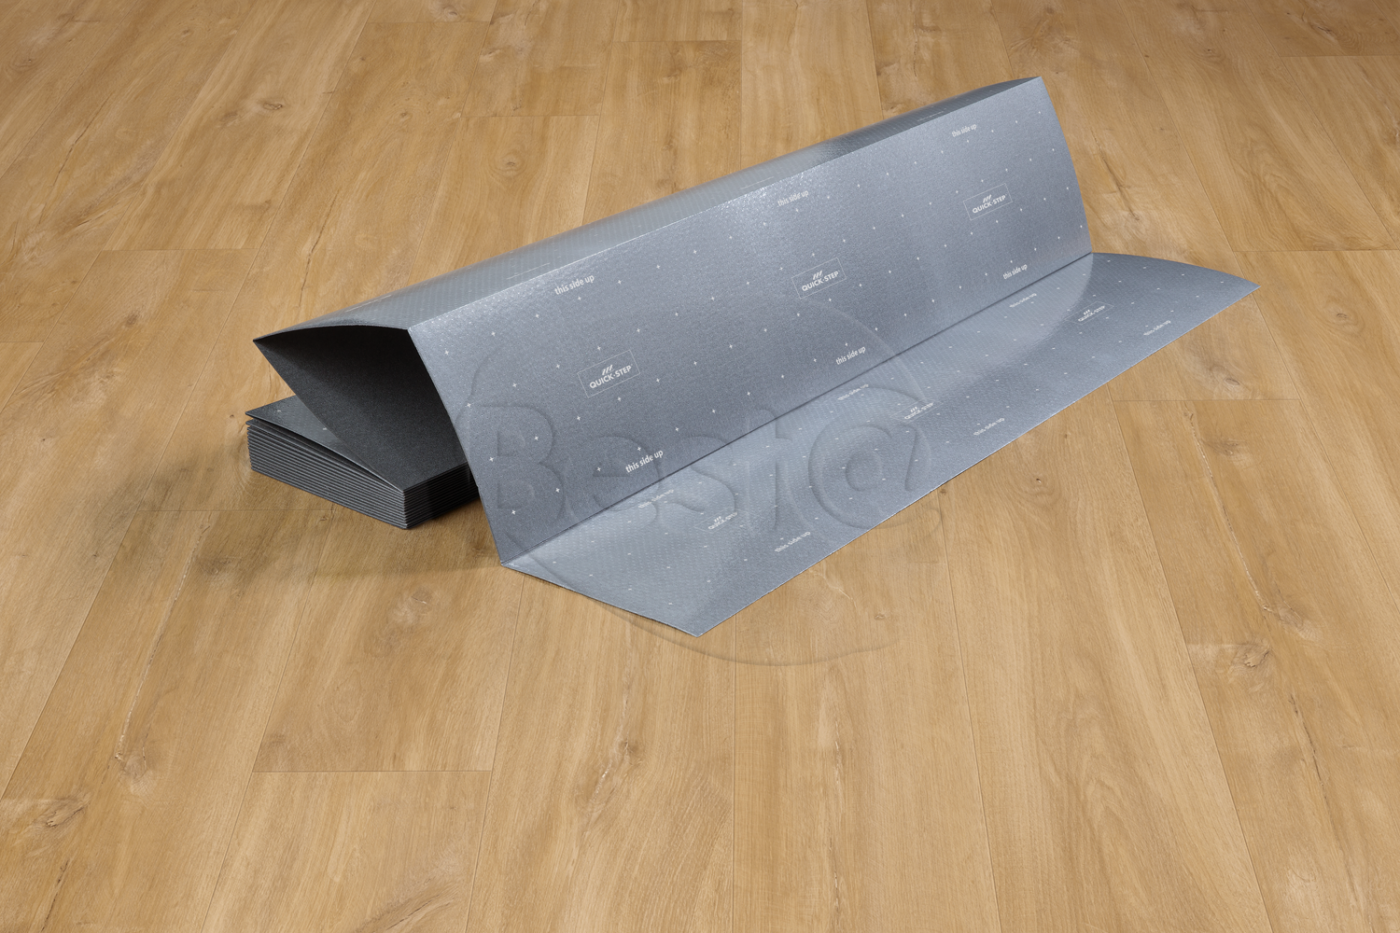 Livyn underlay quick step accessories bestatflooring for Quick step livyn prix